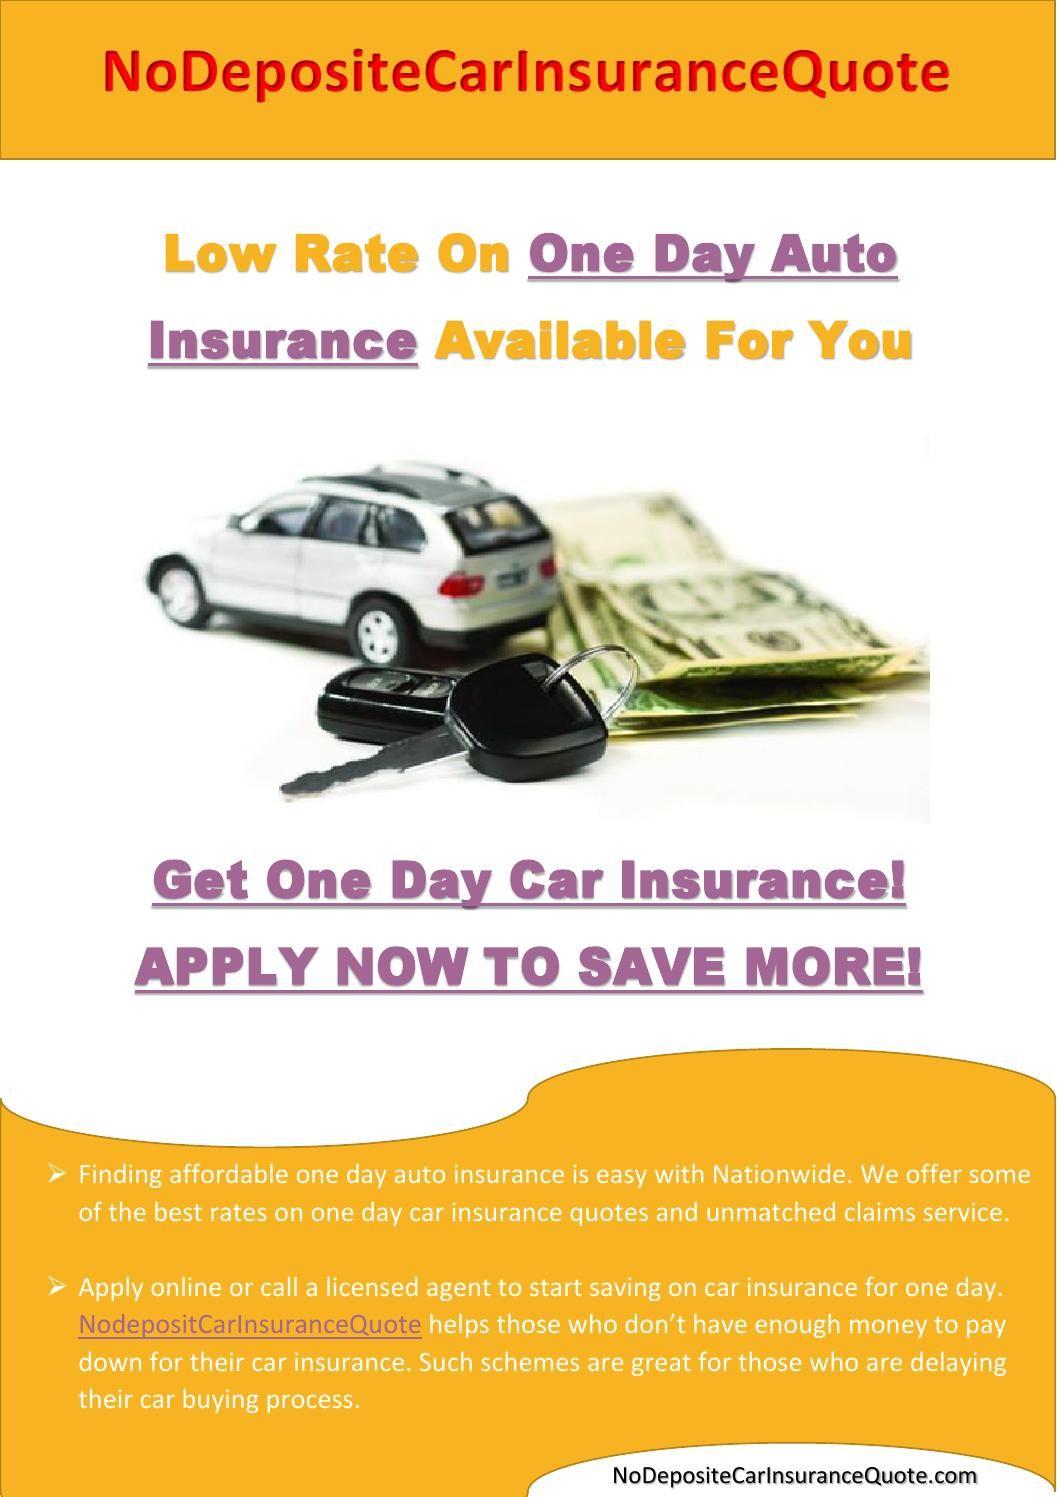 One Day Car Insurance One Day Car Insurance Car Insurance Cars